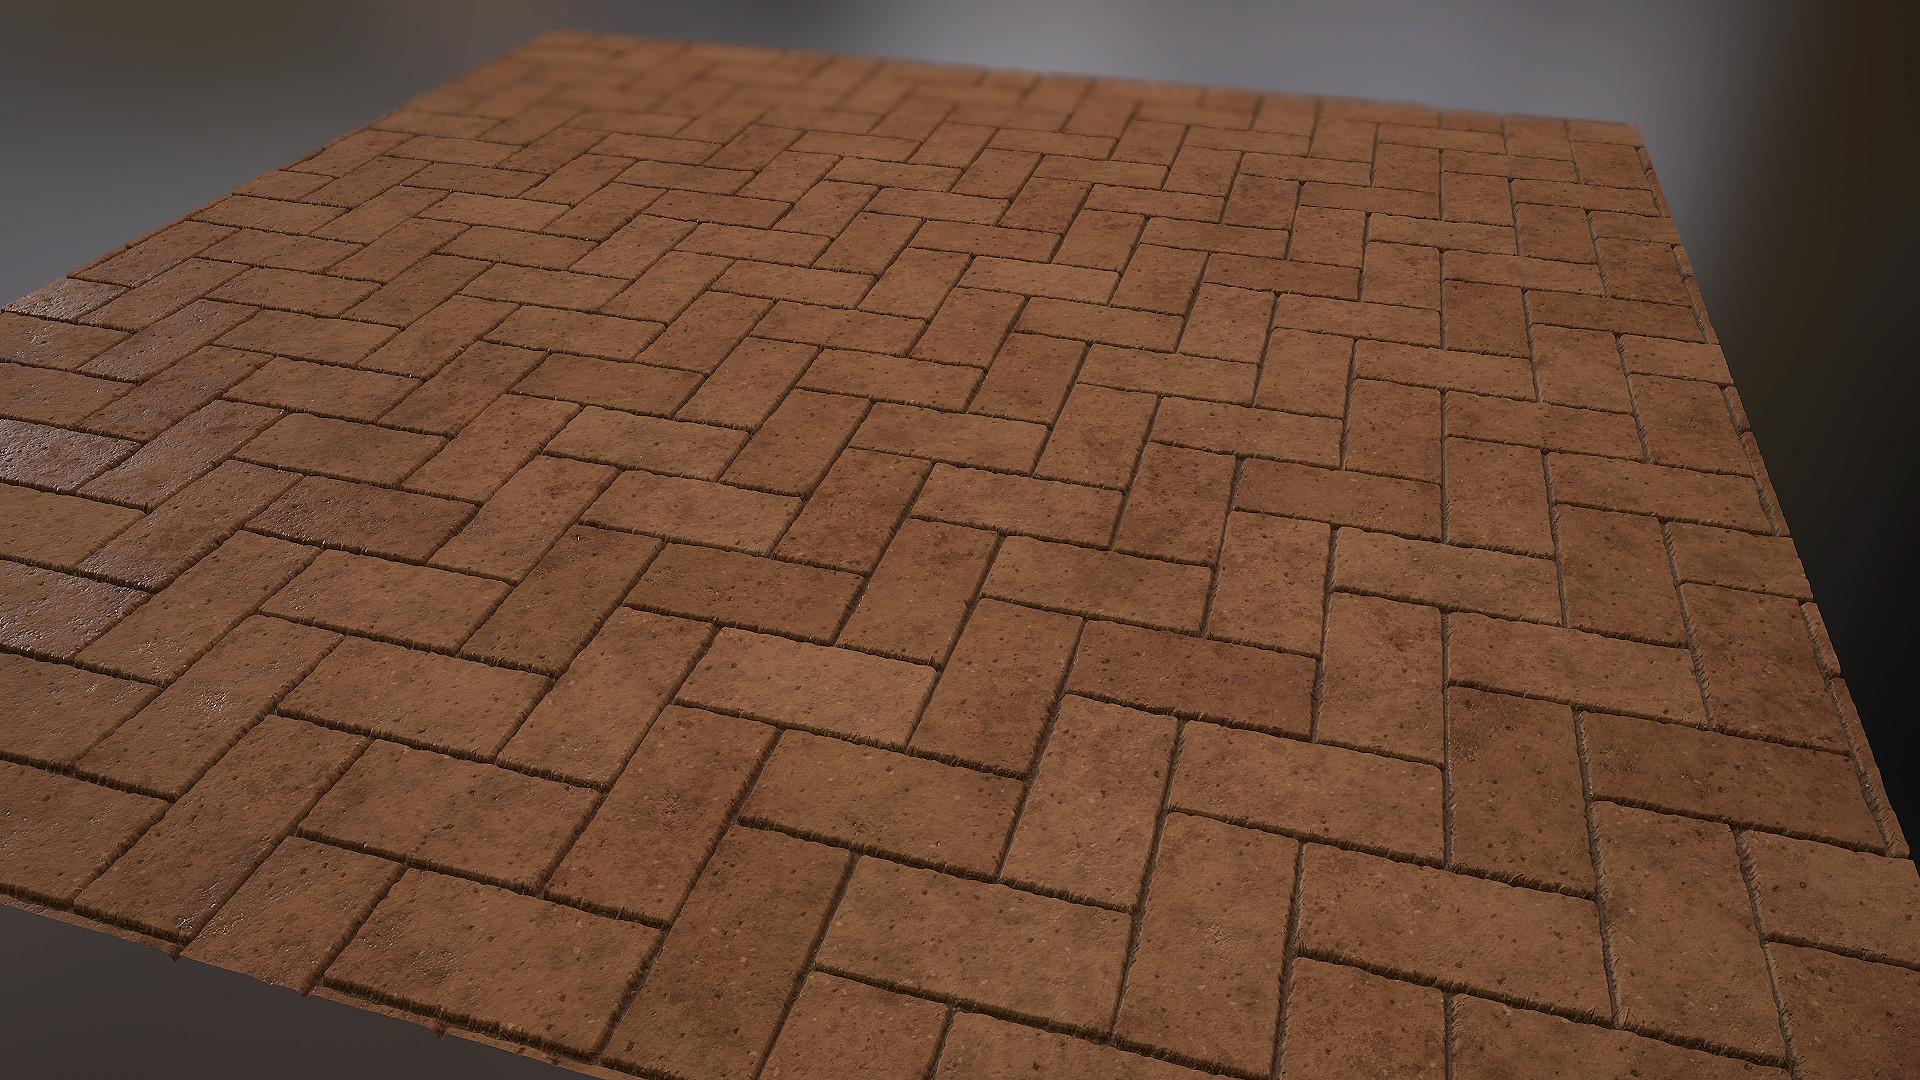 Andre jonsson herringbone brick 01